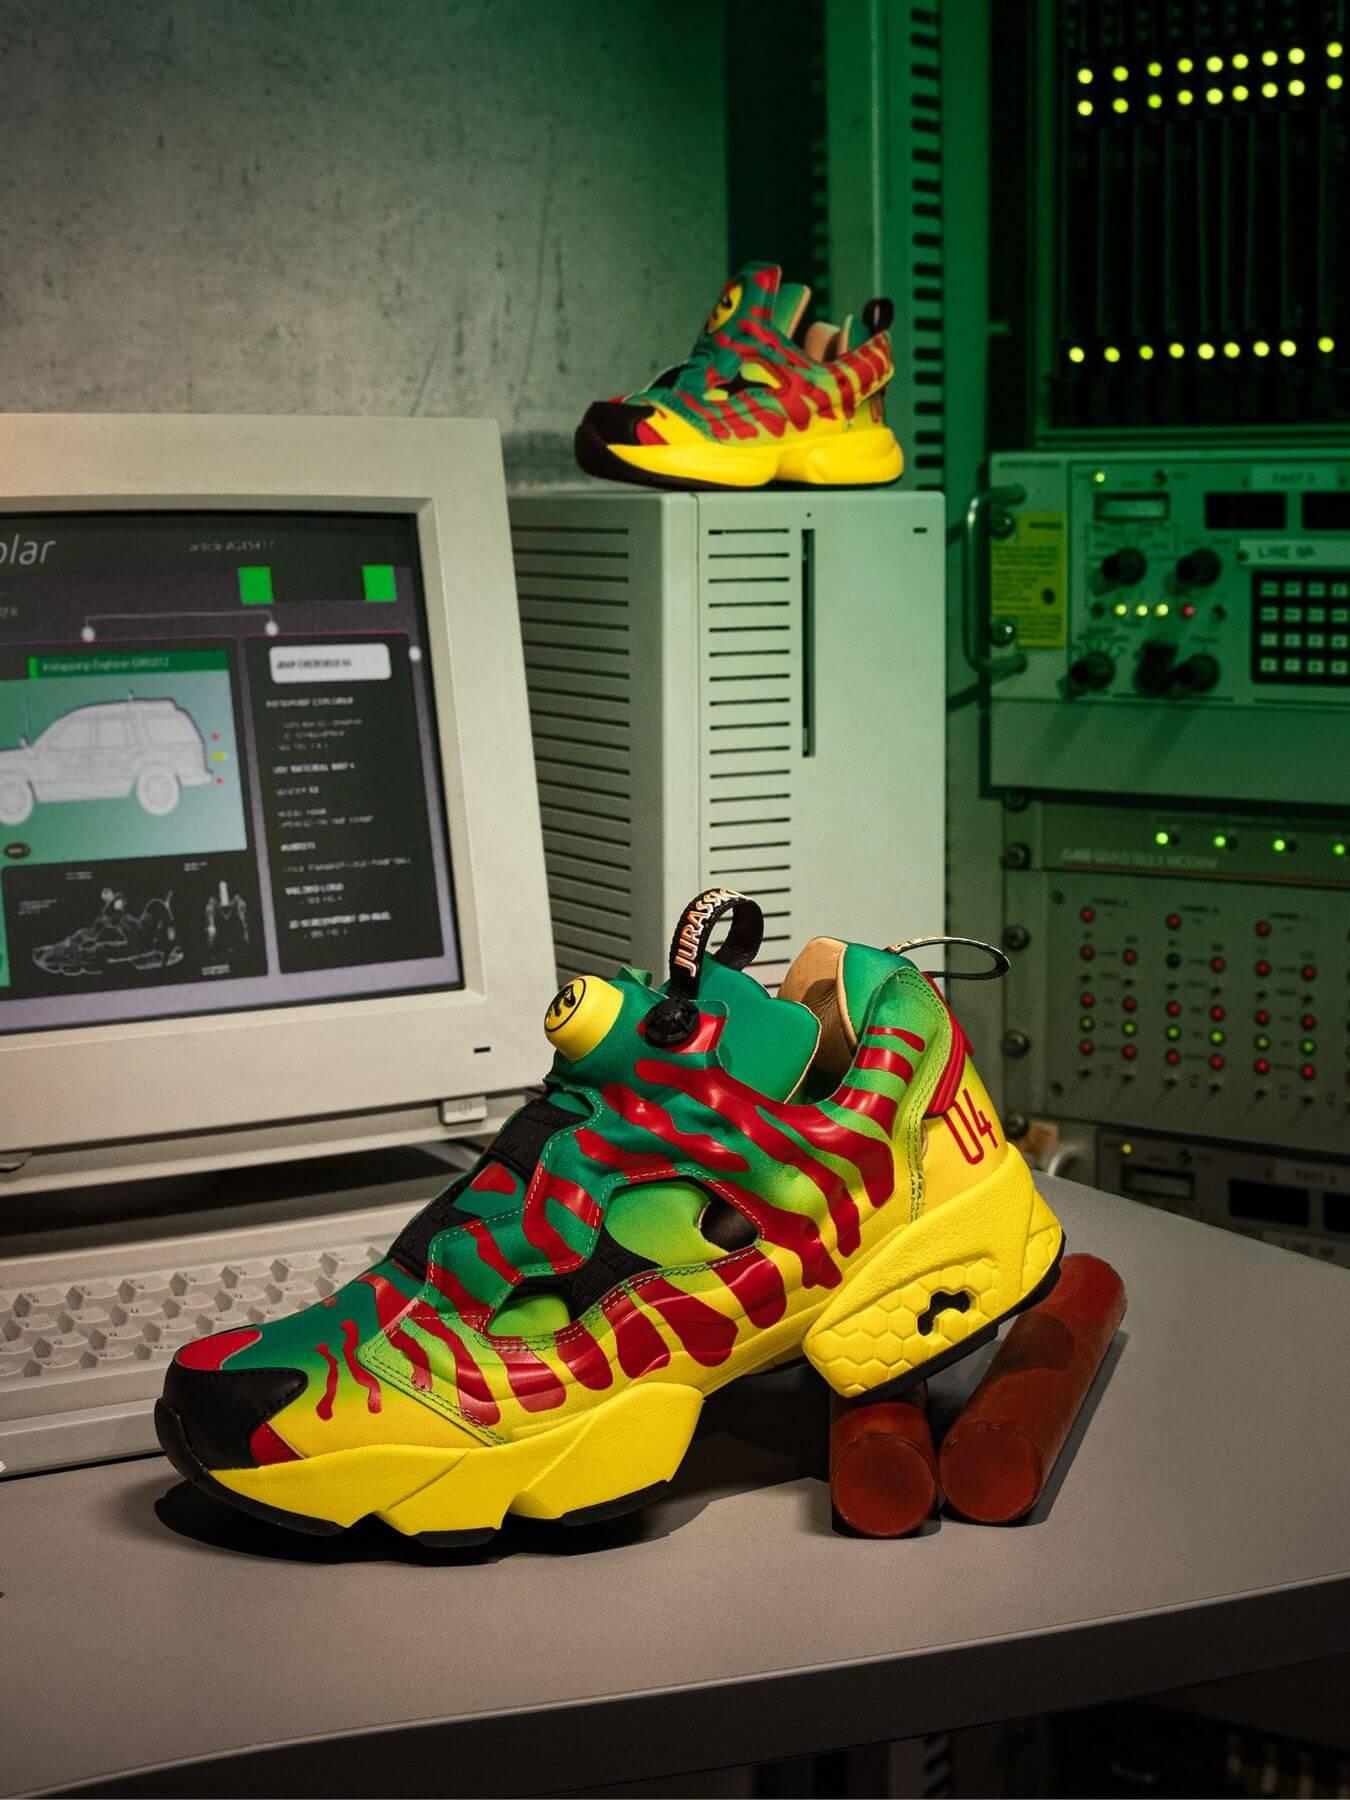 Reebok x Jurassic Park - Instapump Fury - green/yellow/red-black - GW0212